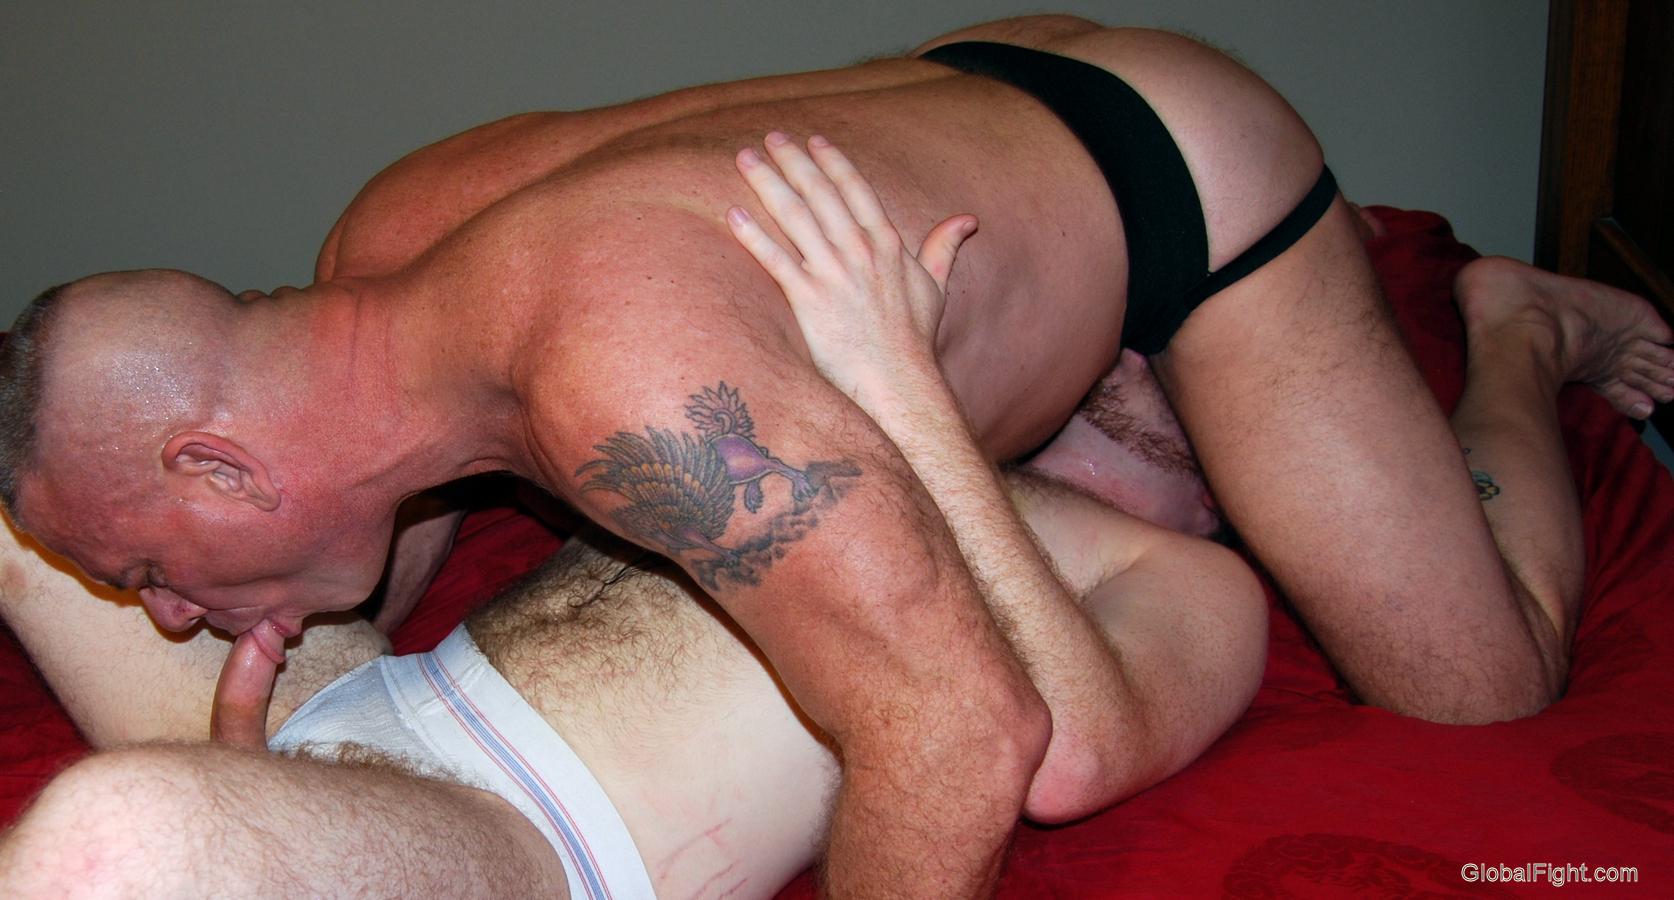 local sex partners sex site